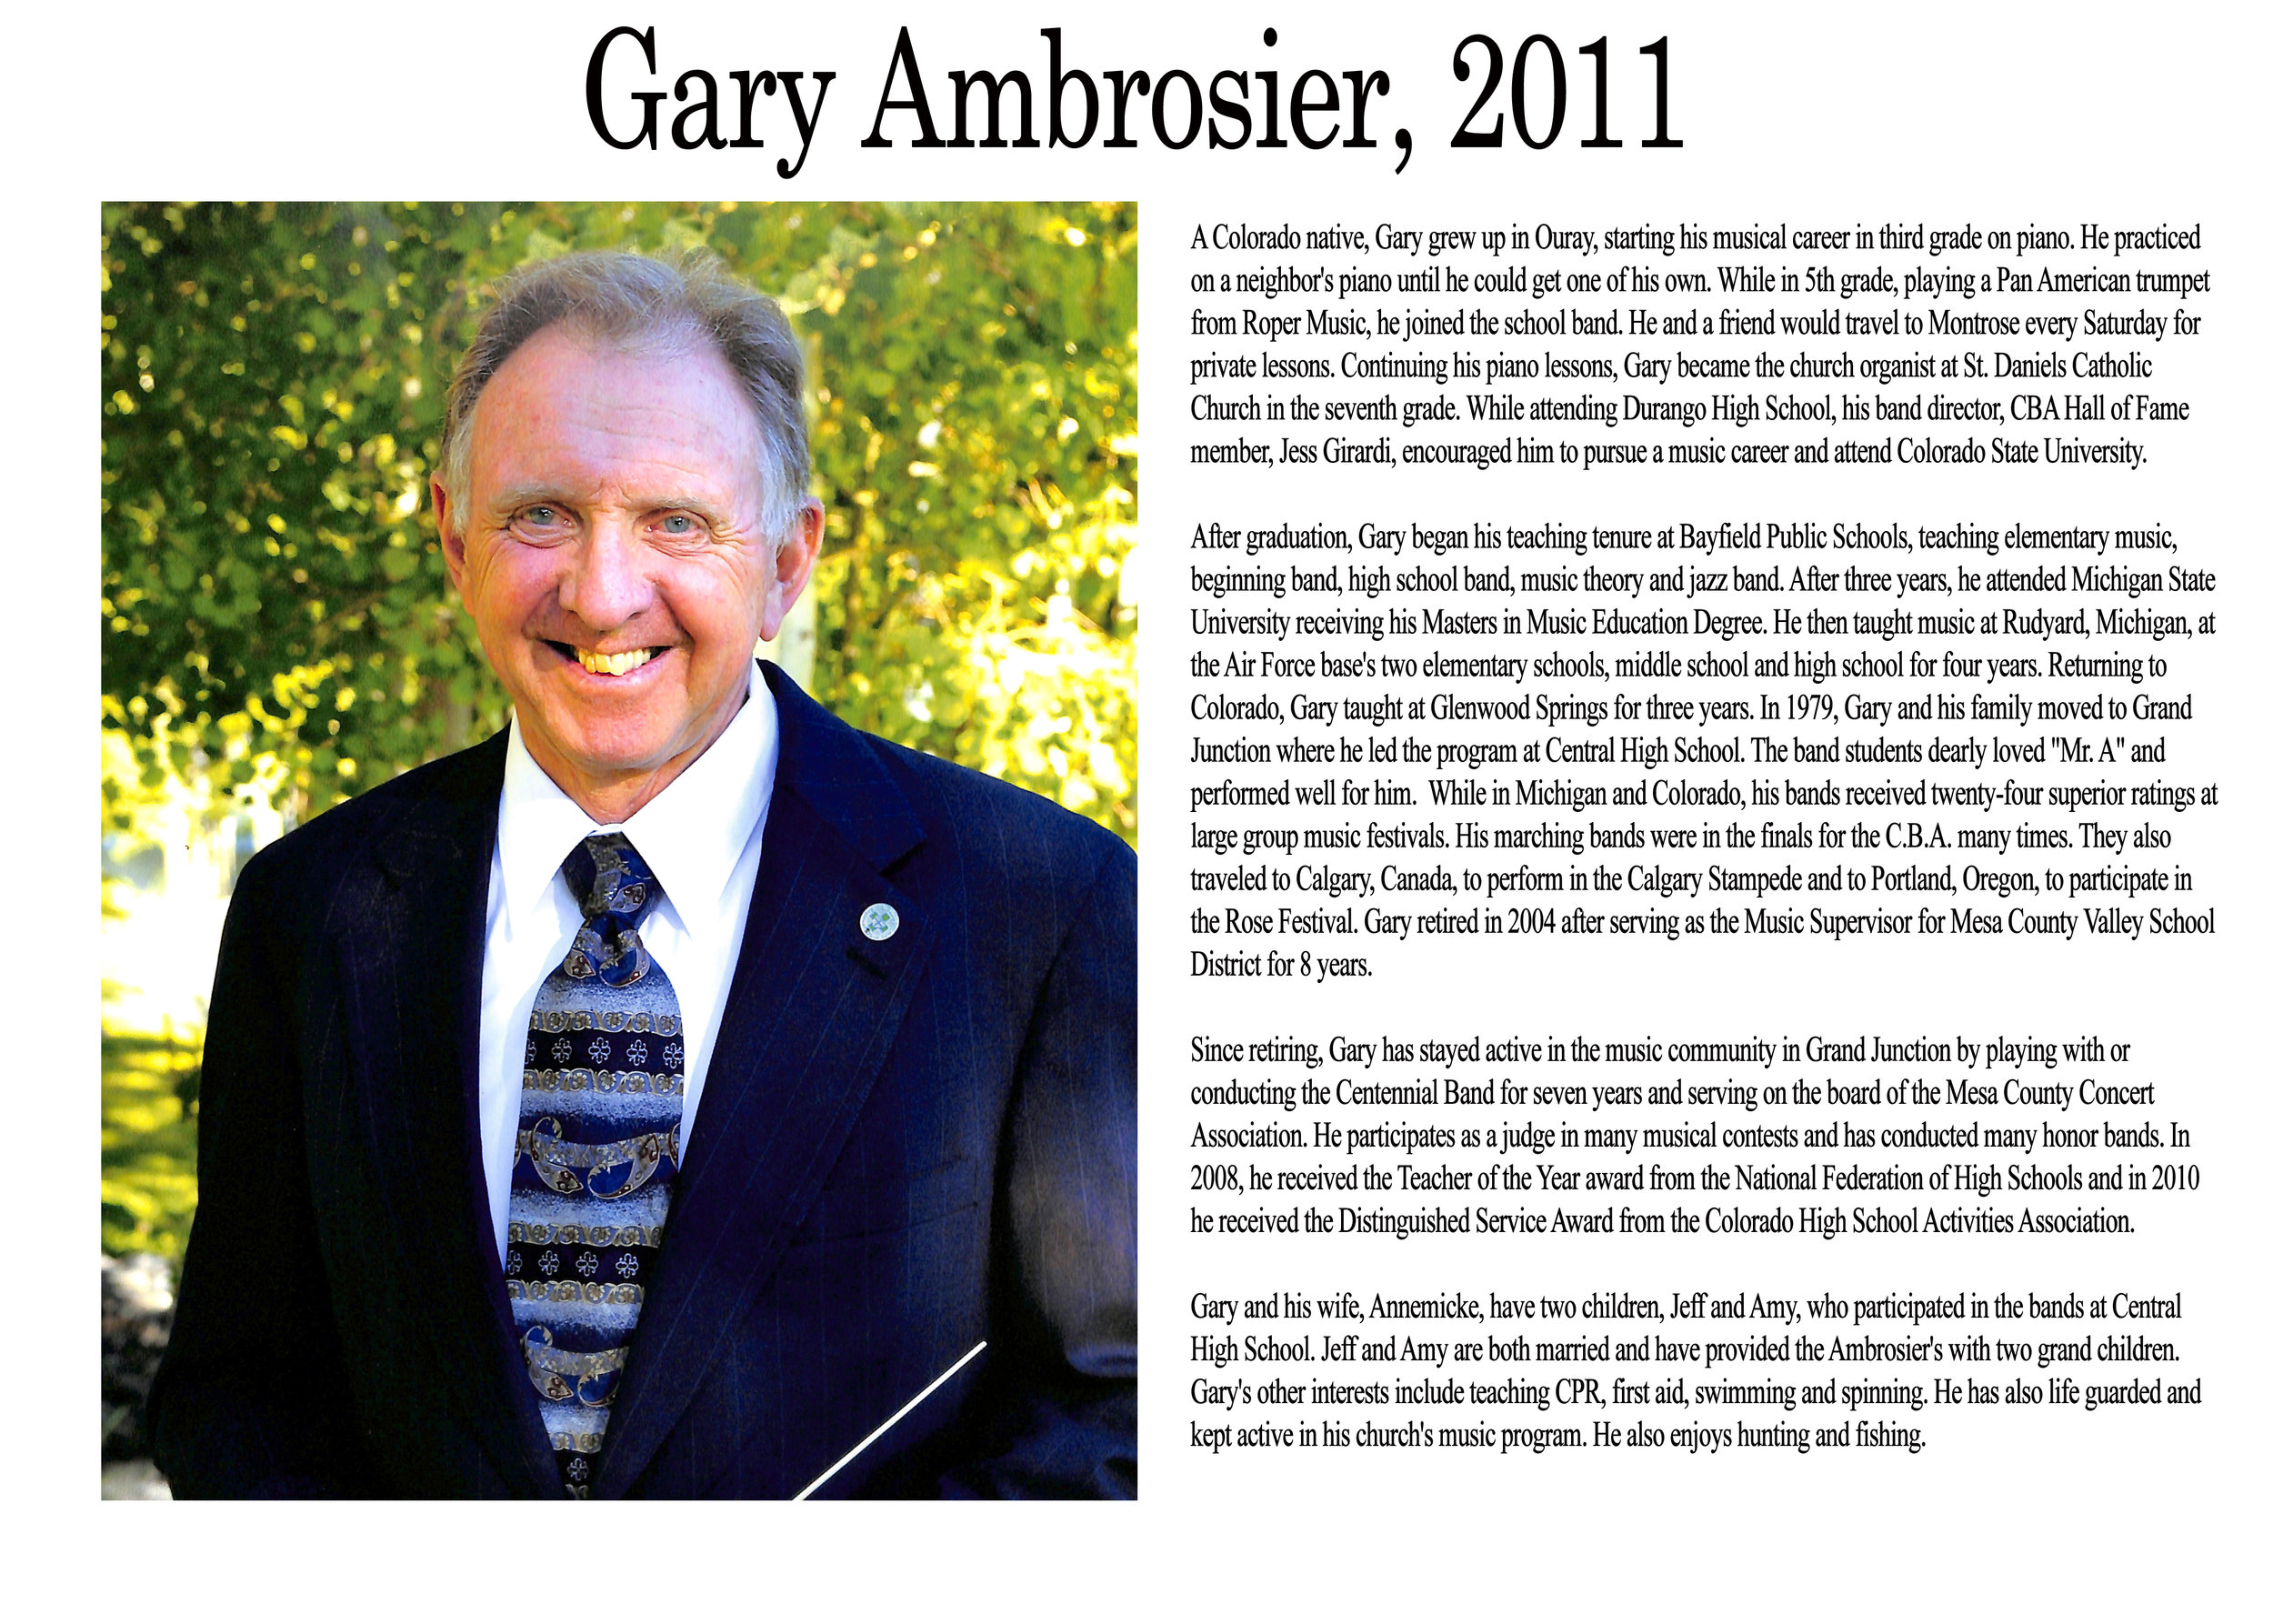 Gary Ambrosier.jpg